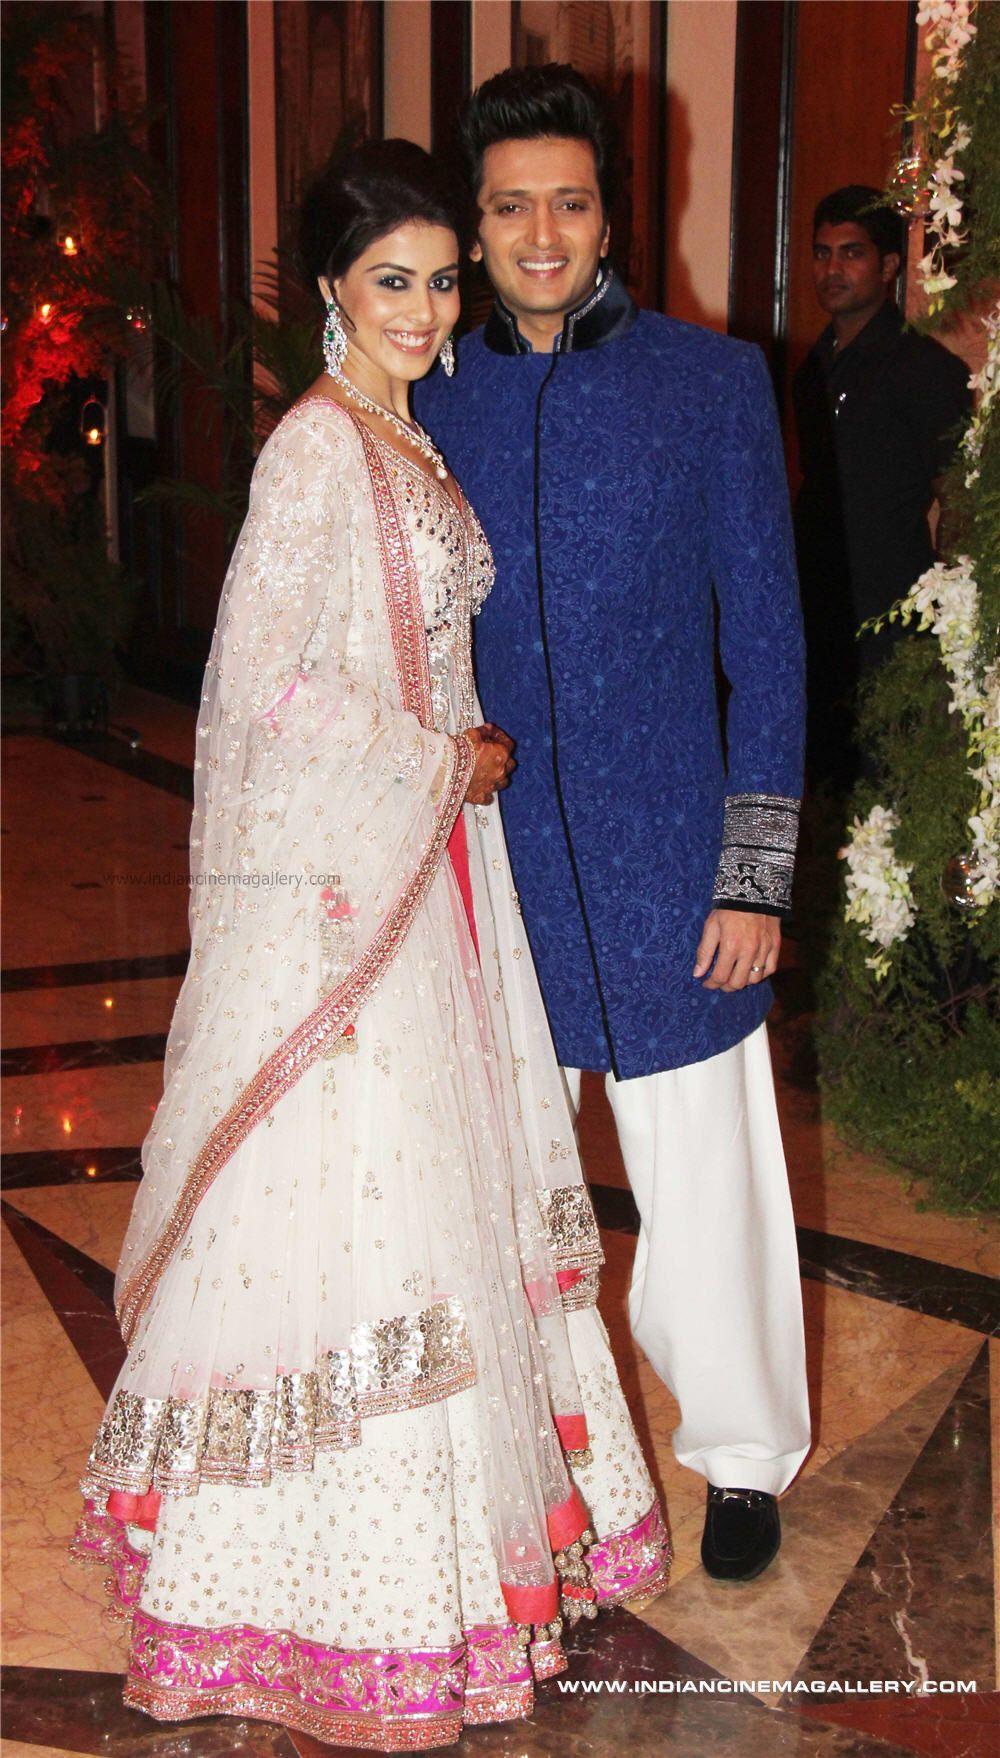 Genelia D\'Souza and Riteish Deshmukh | Indian Celebrity wedding ...